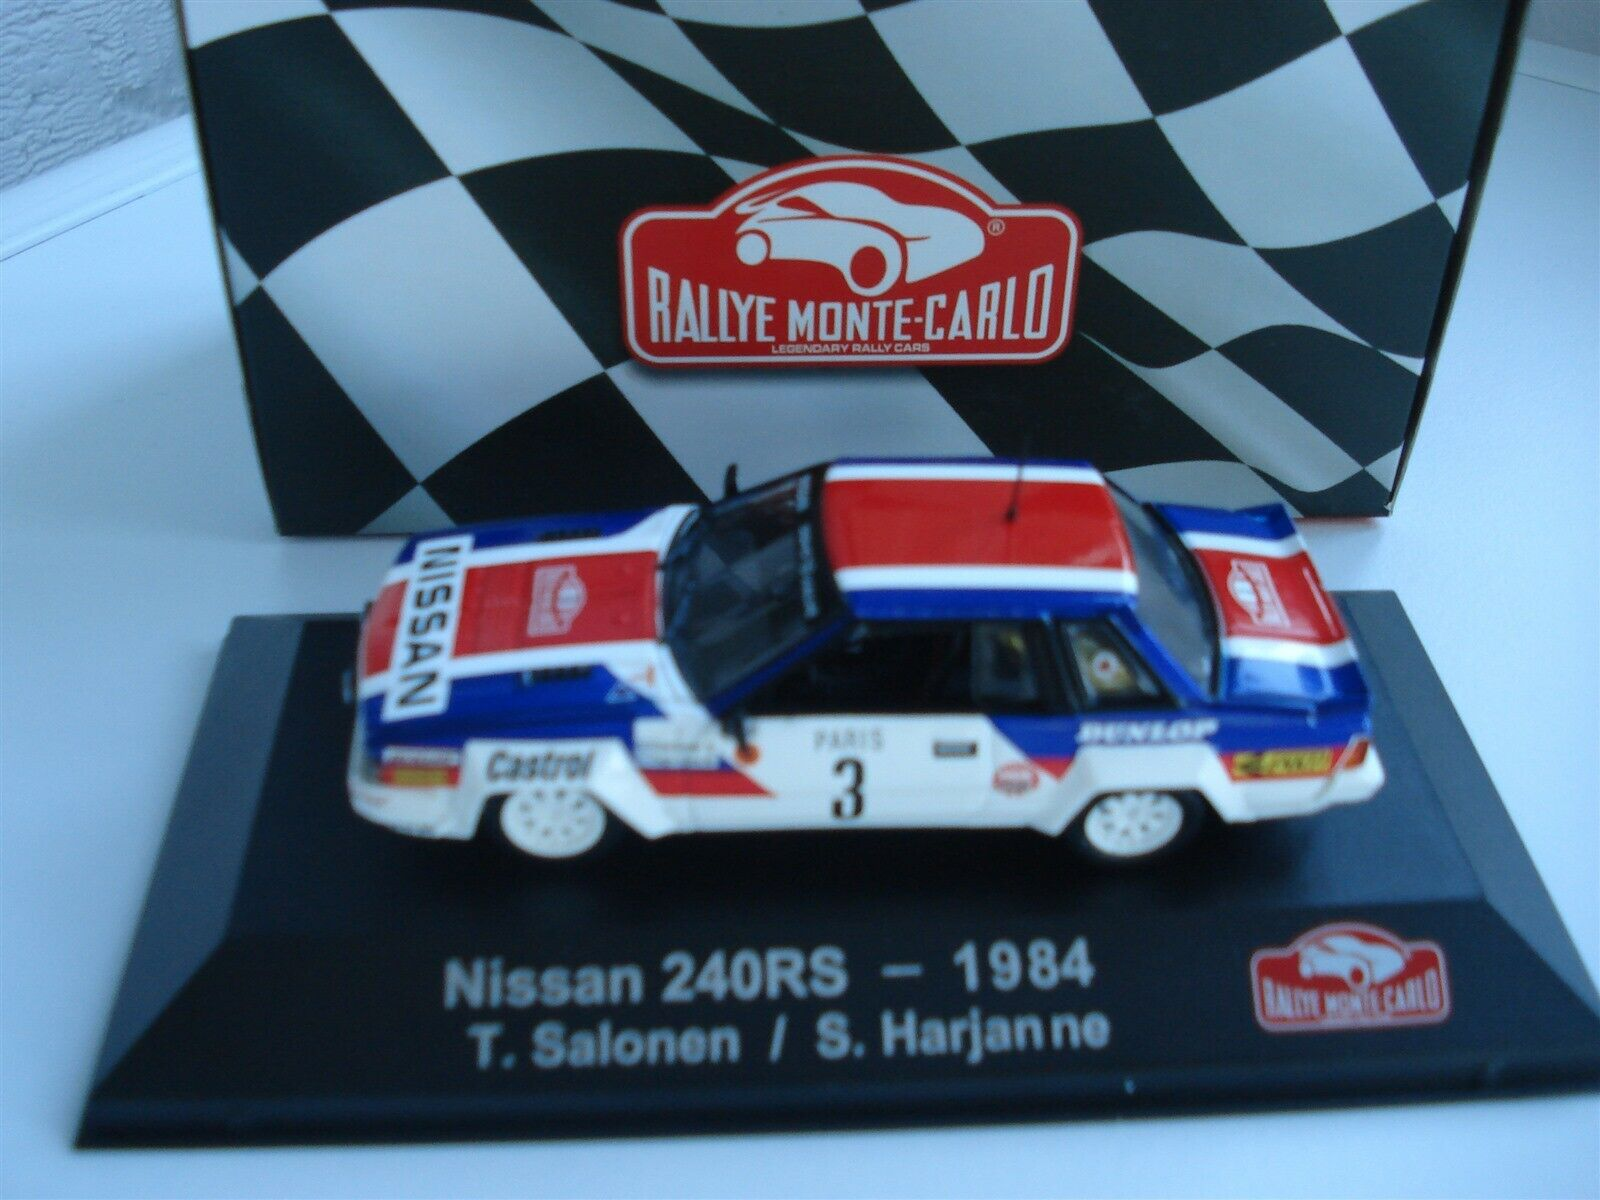 nuevo listado Nissan Nissan Nissan 240RS-Rallye Monte Cochelo - 1 43 - Atlas-como Nuevo en Caja - 1984-Salonen  grandes ofertas